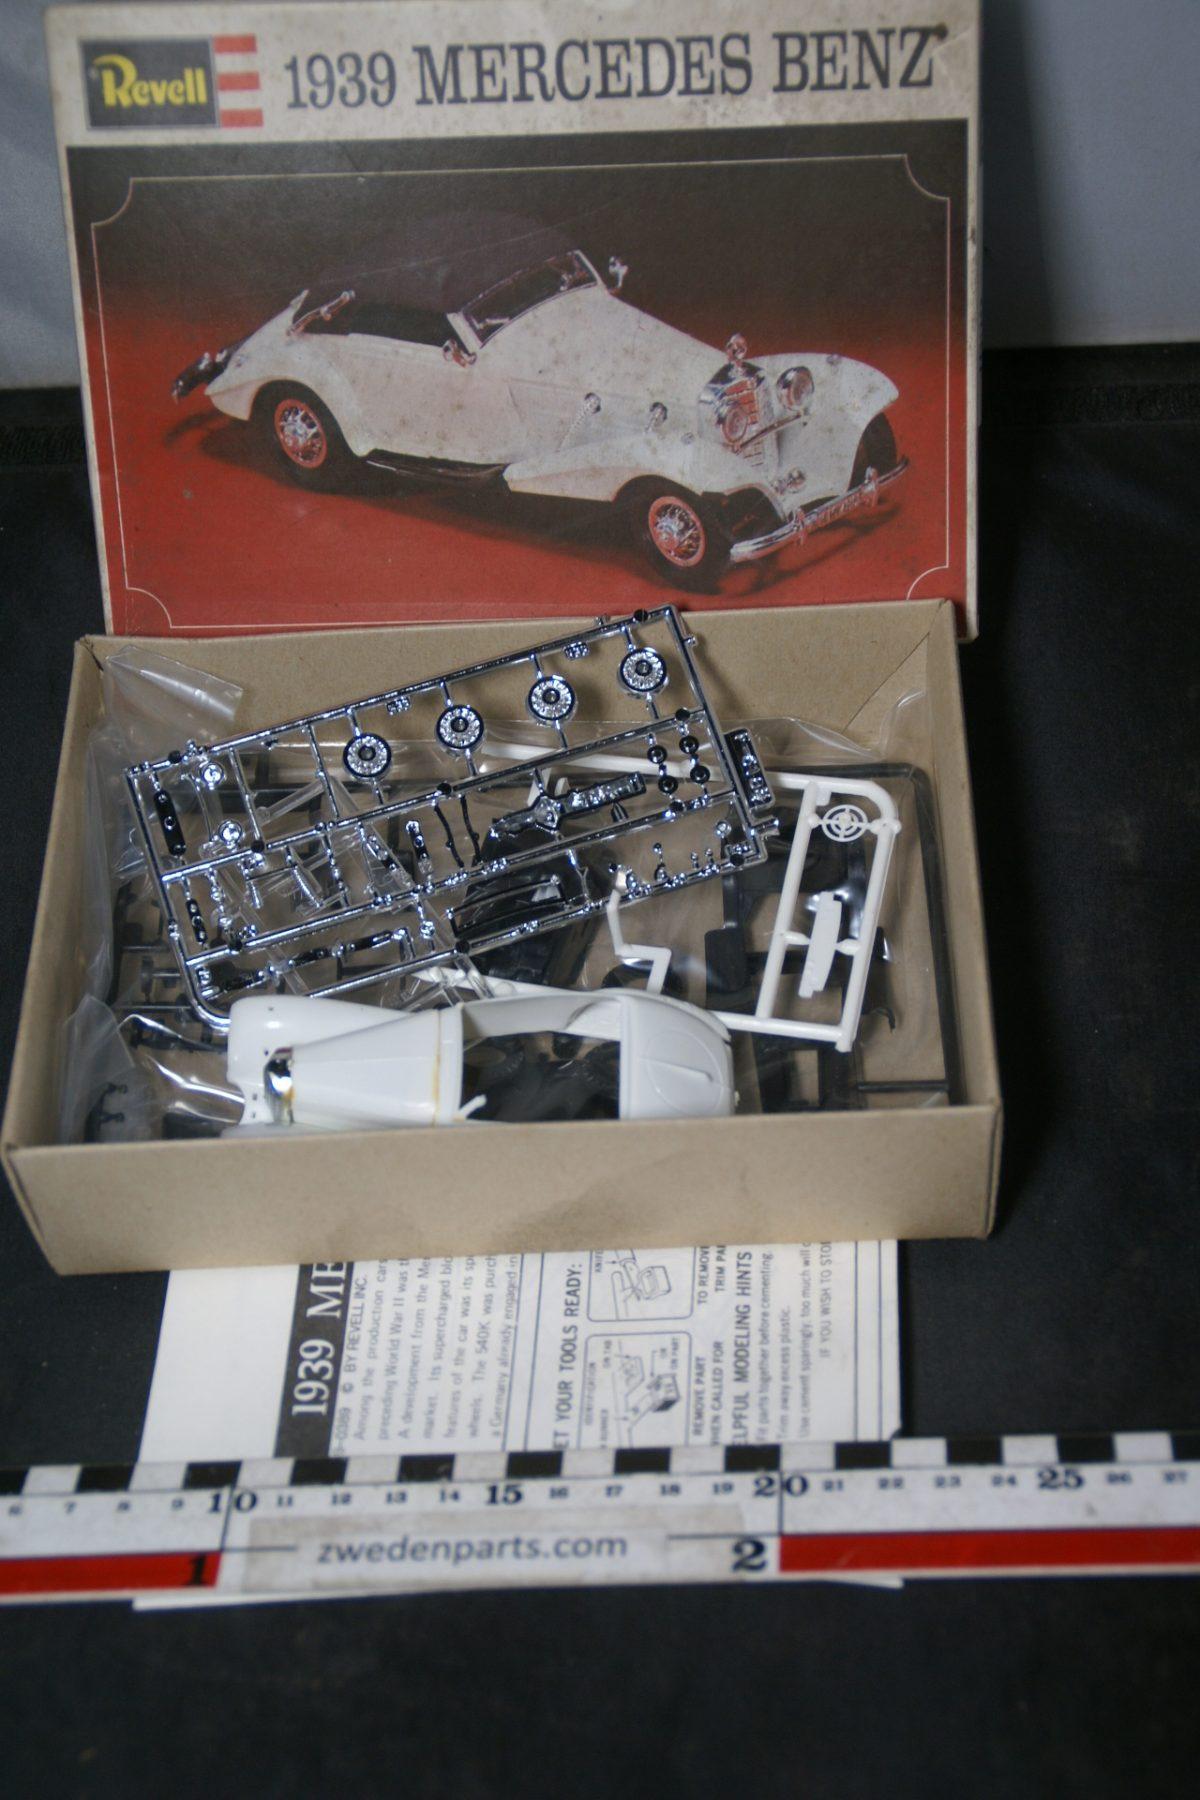 DSC05503 miniatuur 1939 Mercedes Benz bouwdoos ca. 1op43 Mint Revell